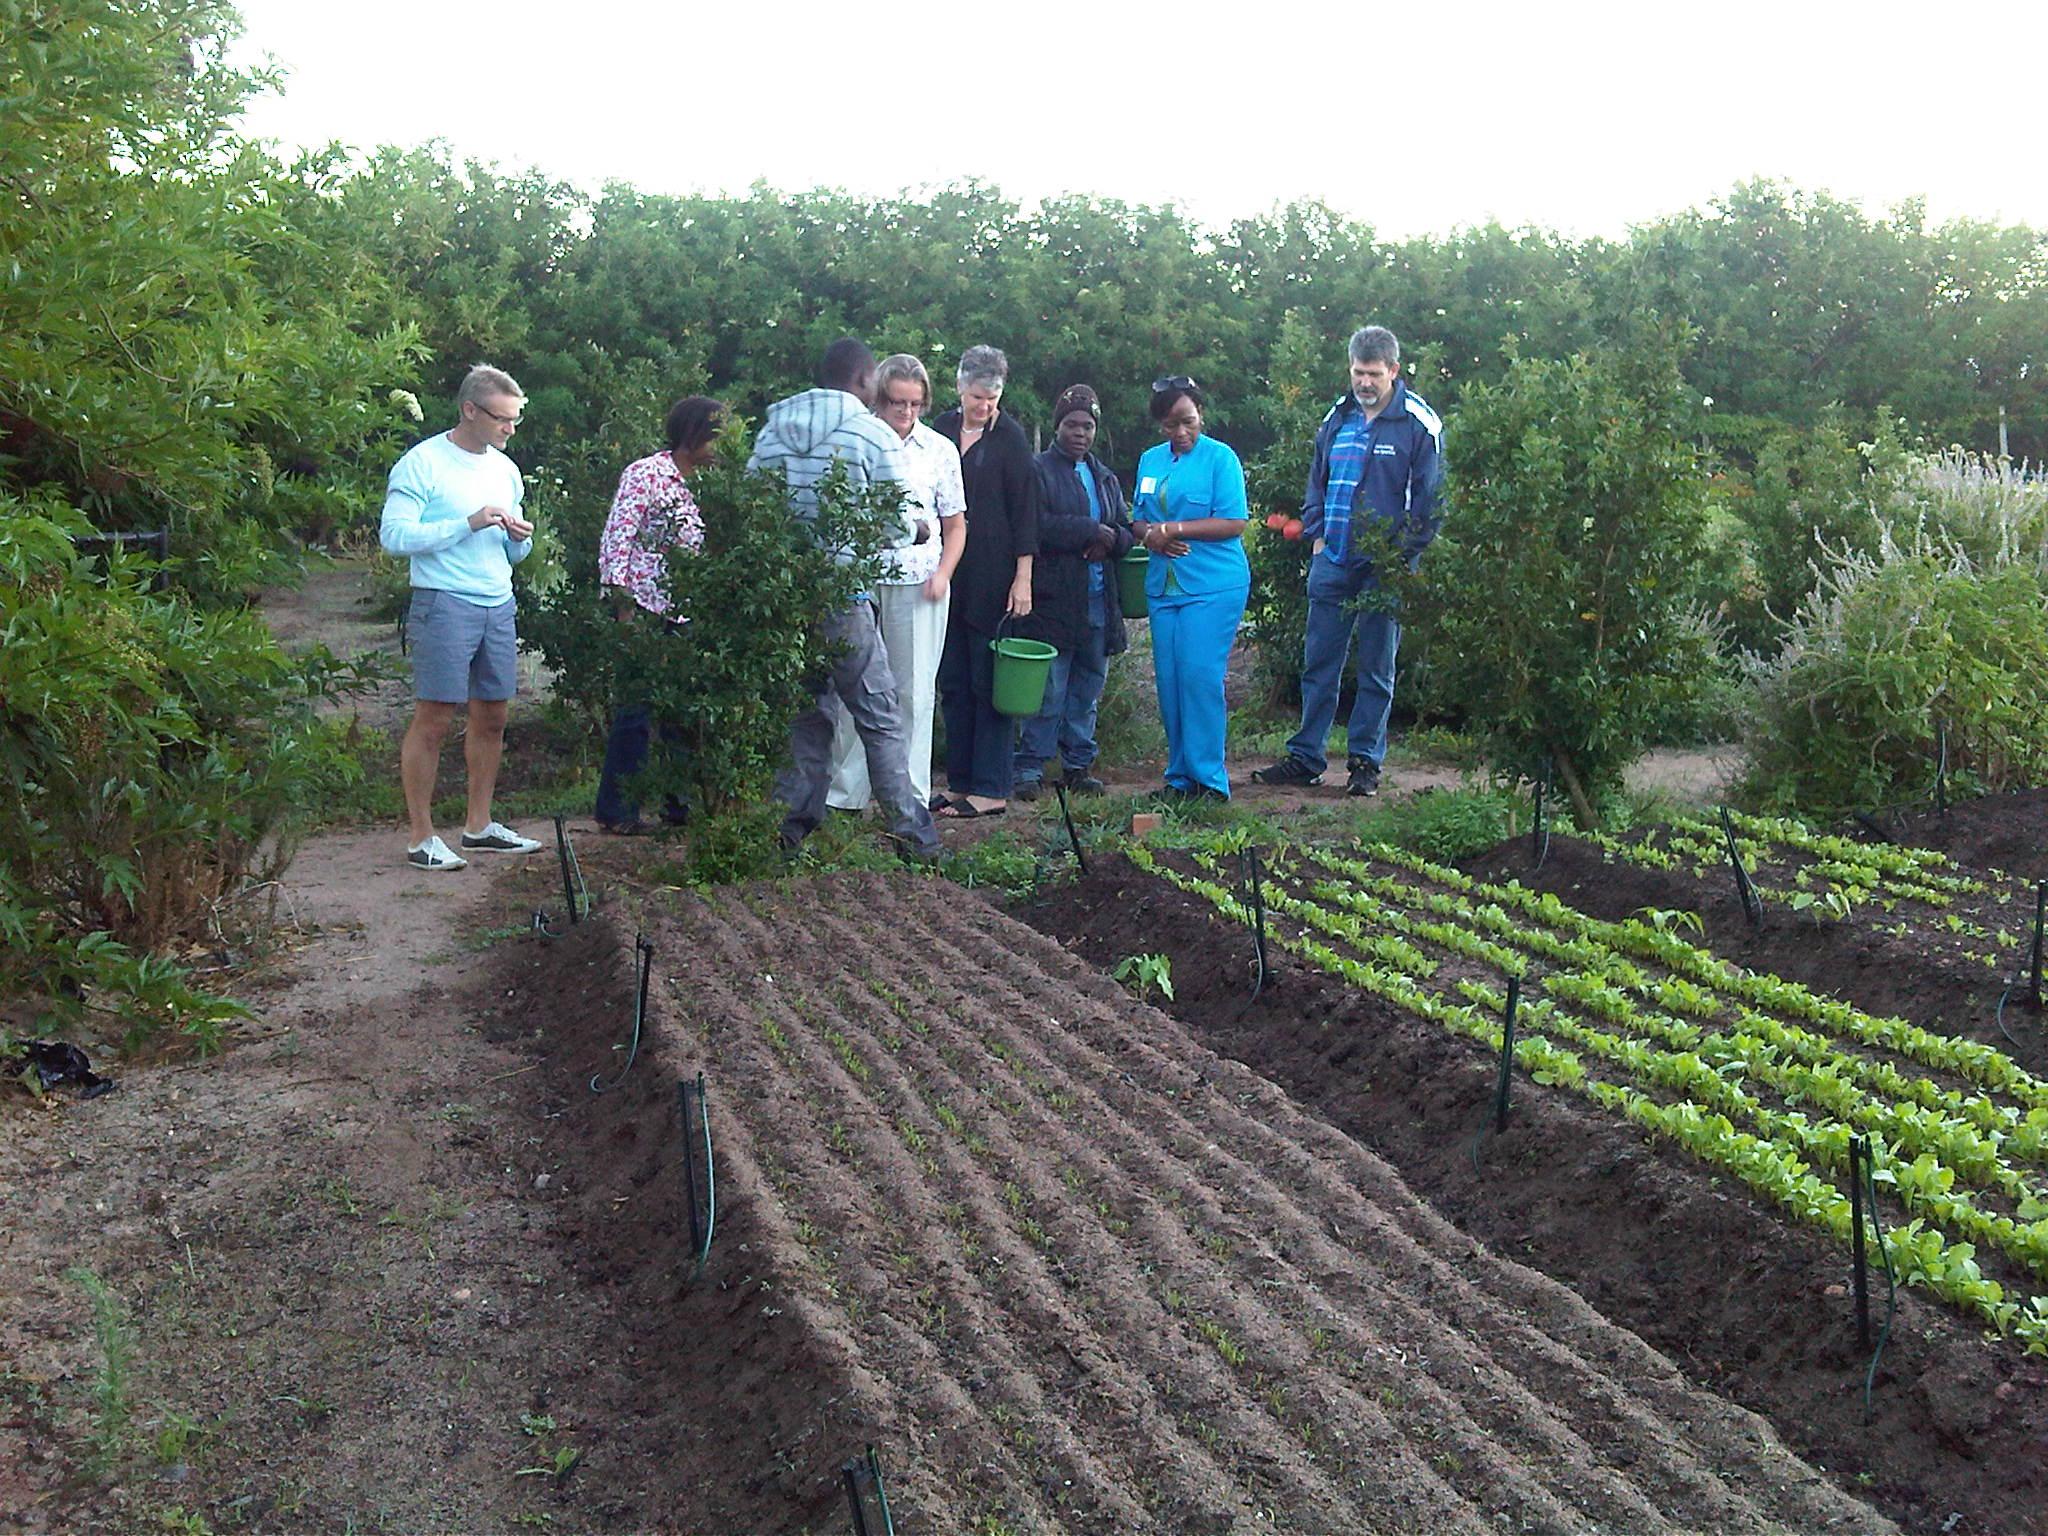 Small-scale farming, Stellenbosch, Cape Town